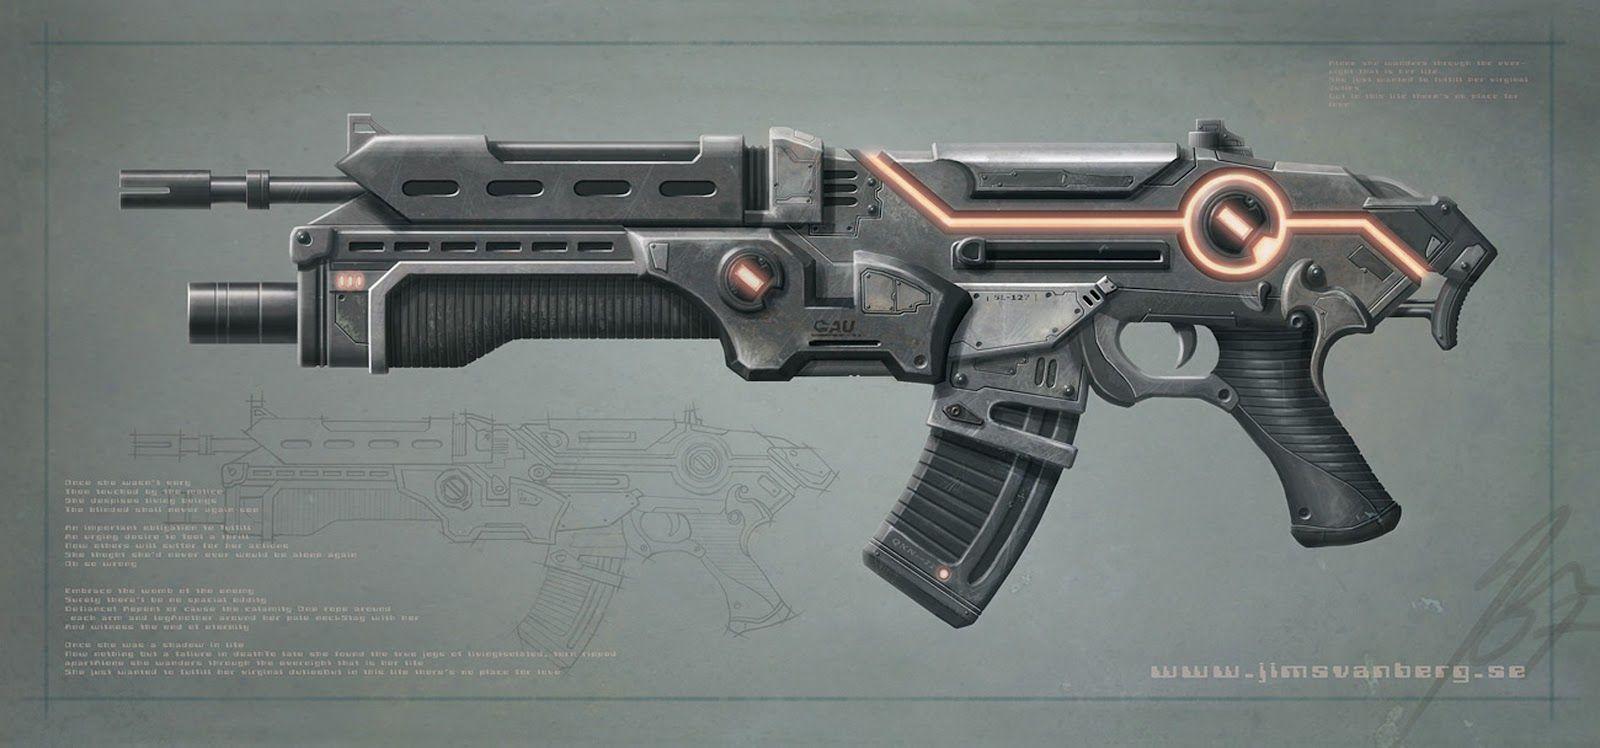 futuristic sci-fi laser gun | Midterm/Captain America ...